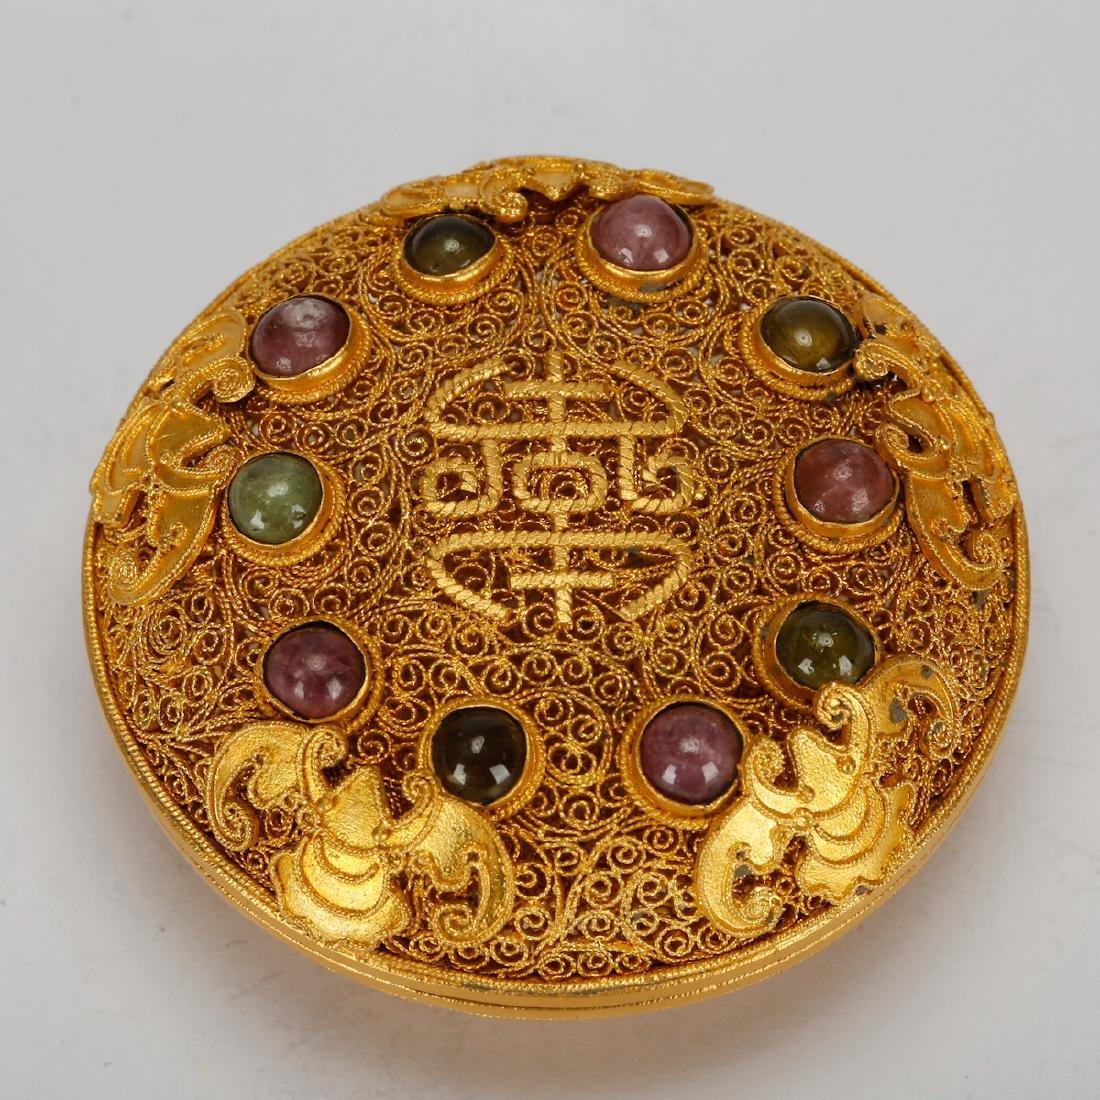 CHINESE GOLD WIRING JEWELRY BOX